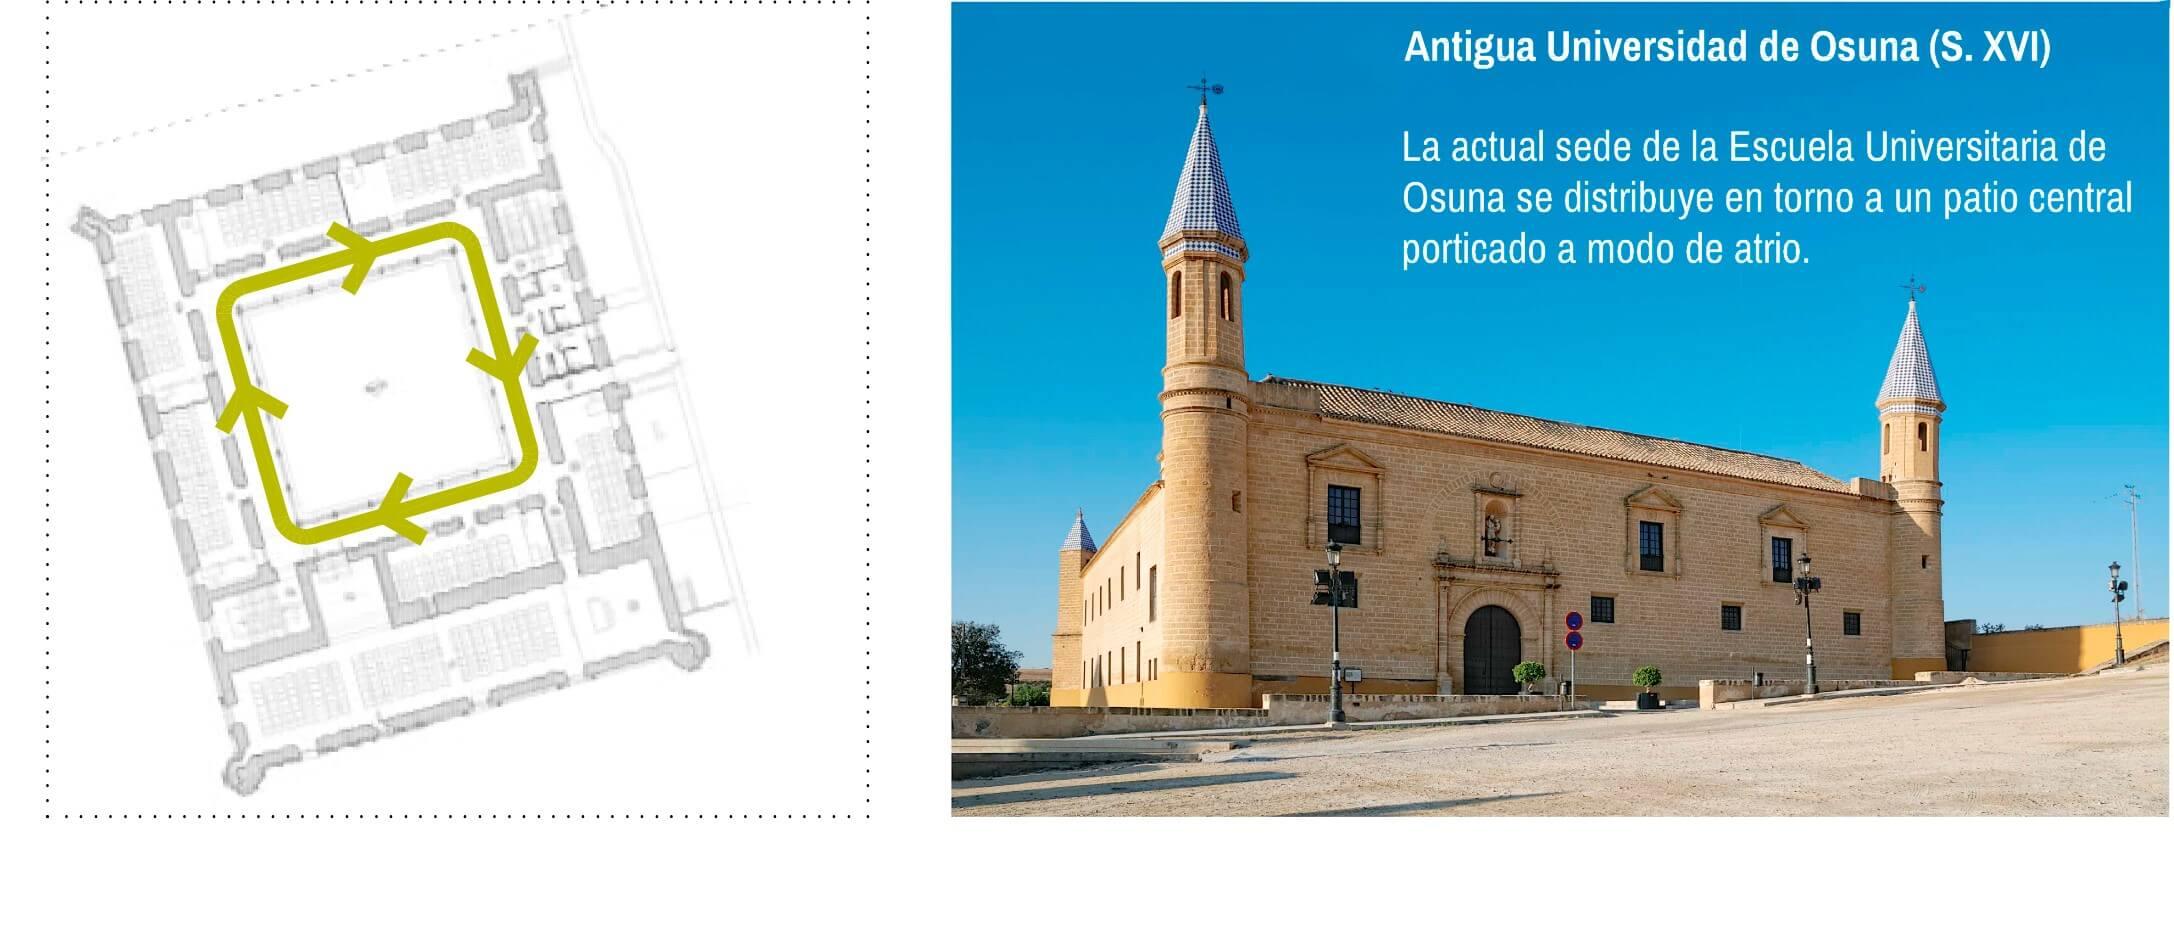 Antigua Universidad de osuna